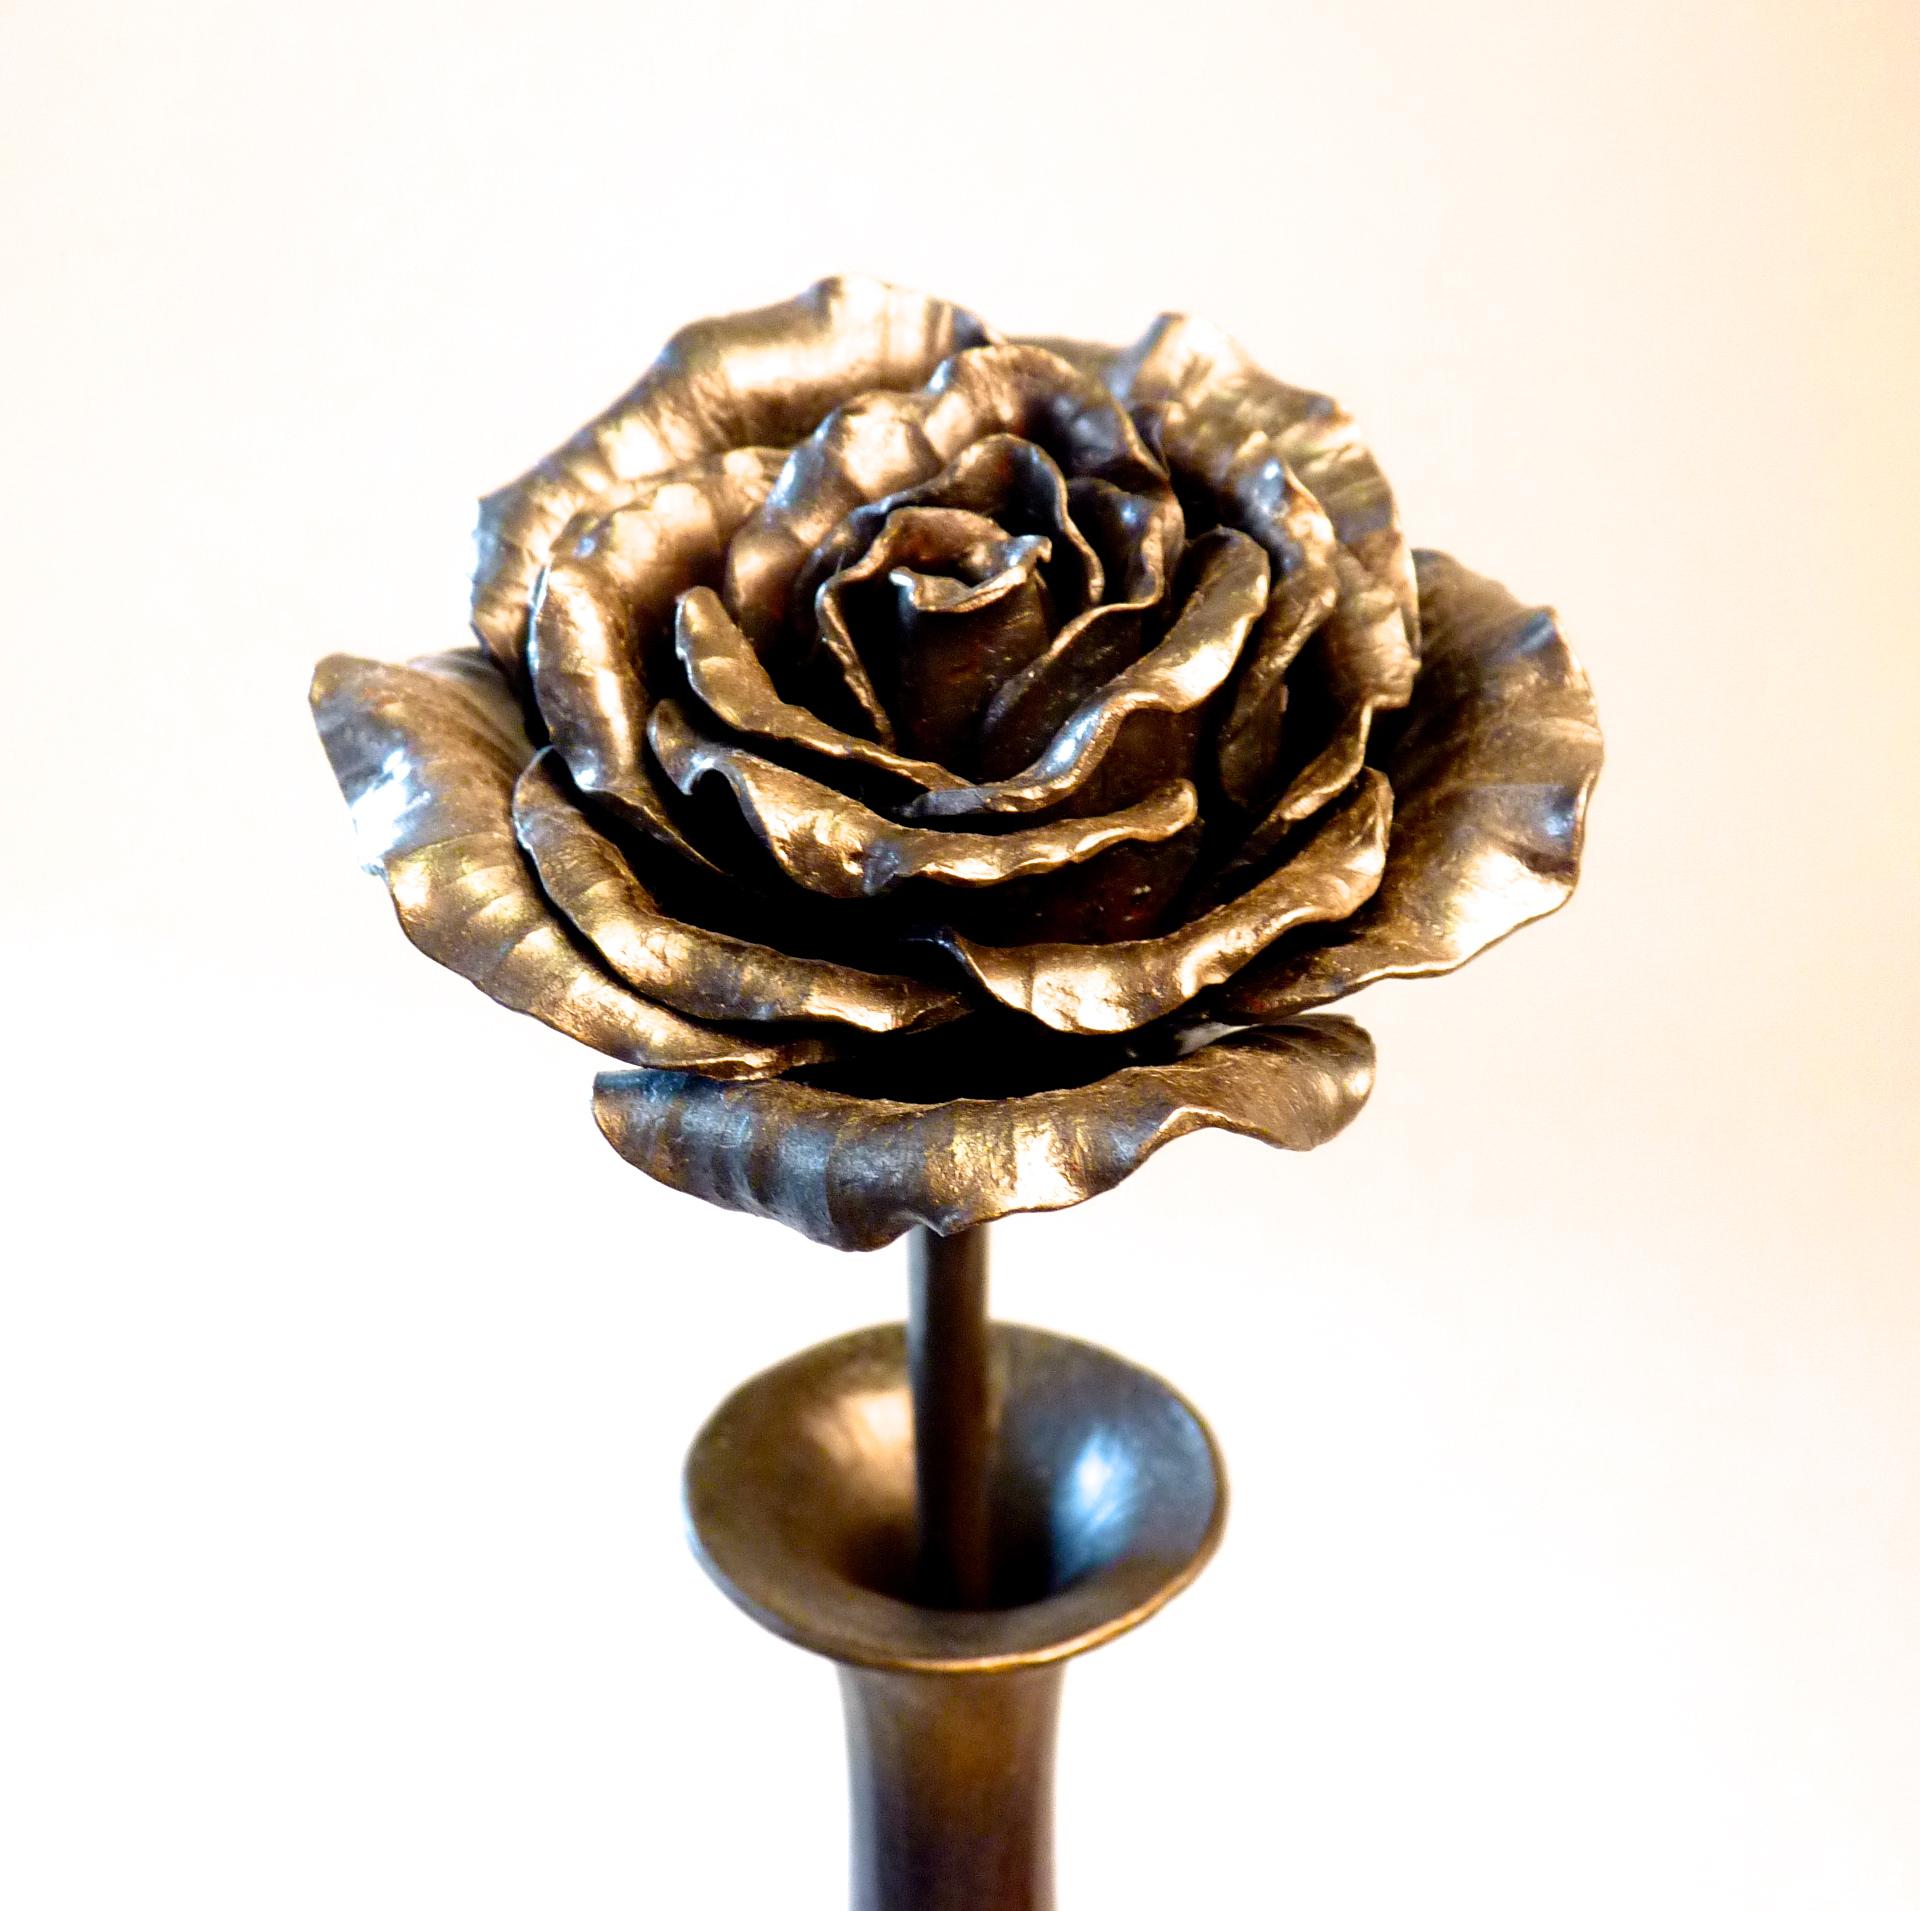 bud vase with rose forged iron lankton metal design